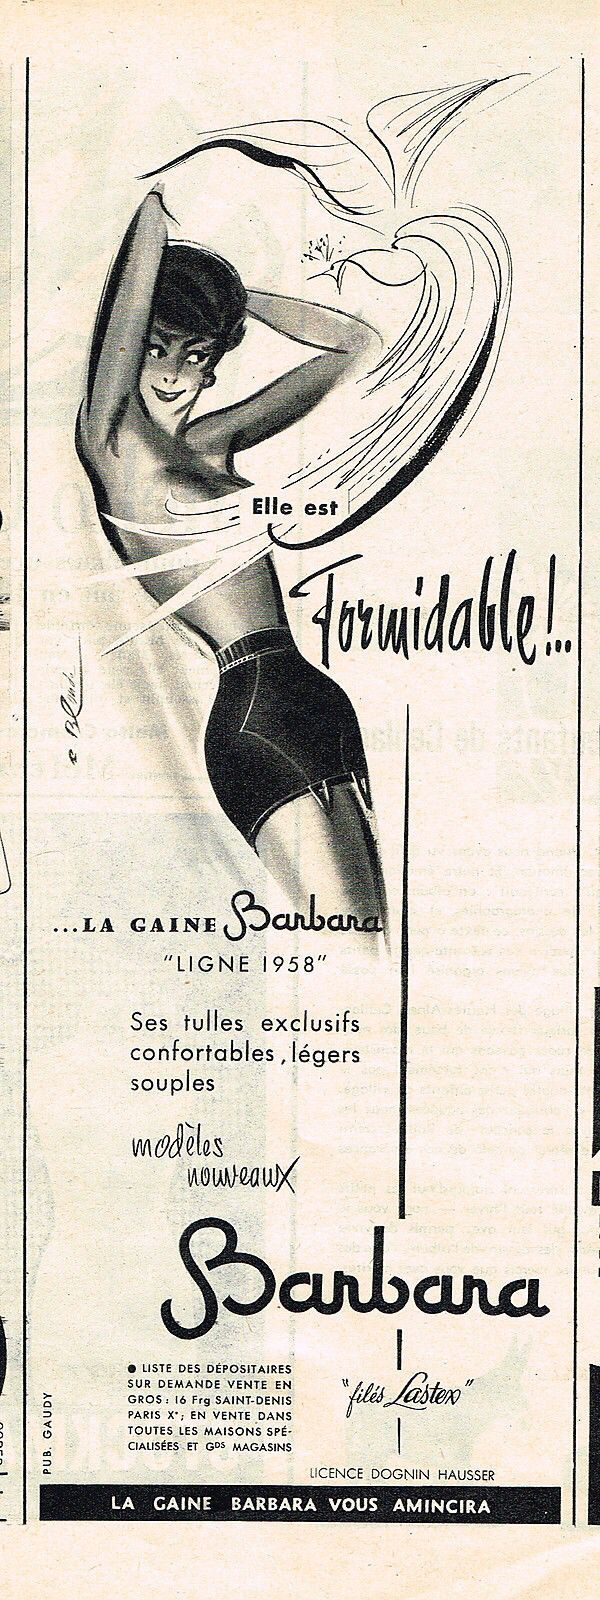 Barbara opend girdle 1958